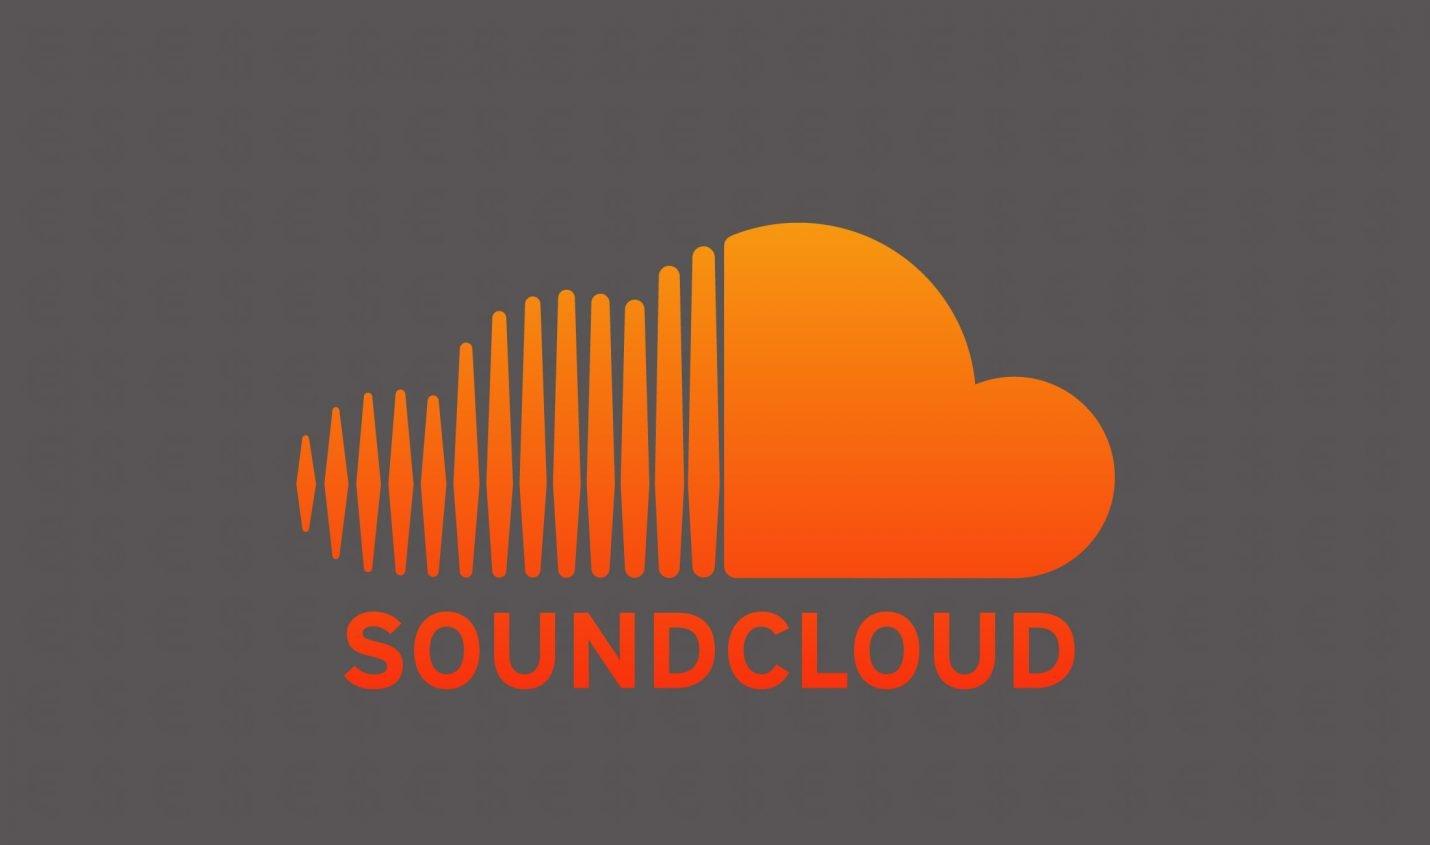 Soundcloud plant wohl neues Bezahlmodell - direkte Bezahlung an Artists